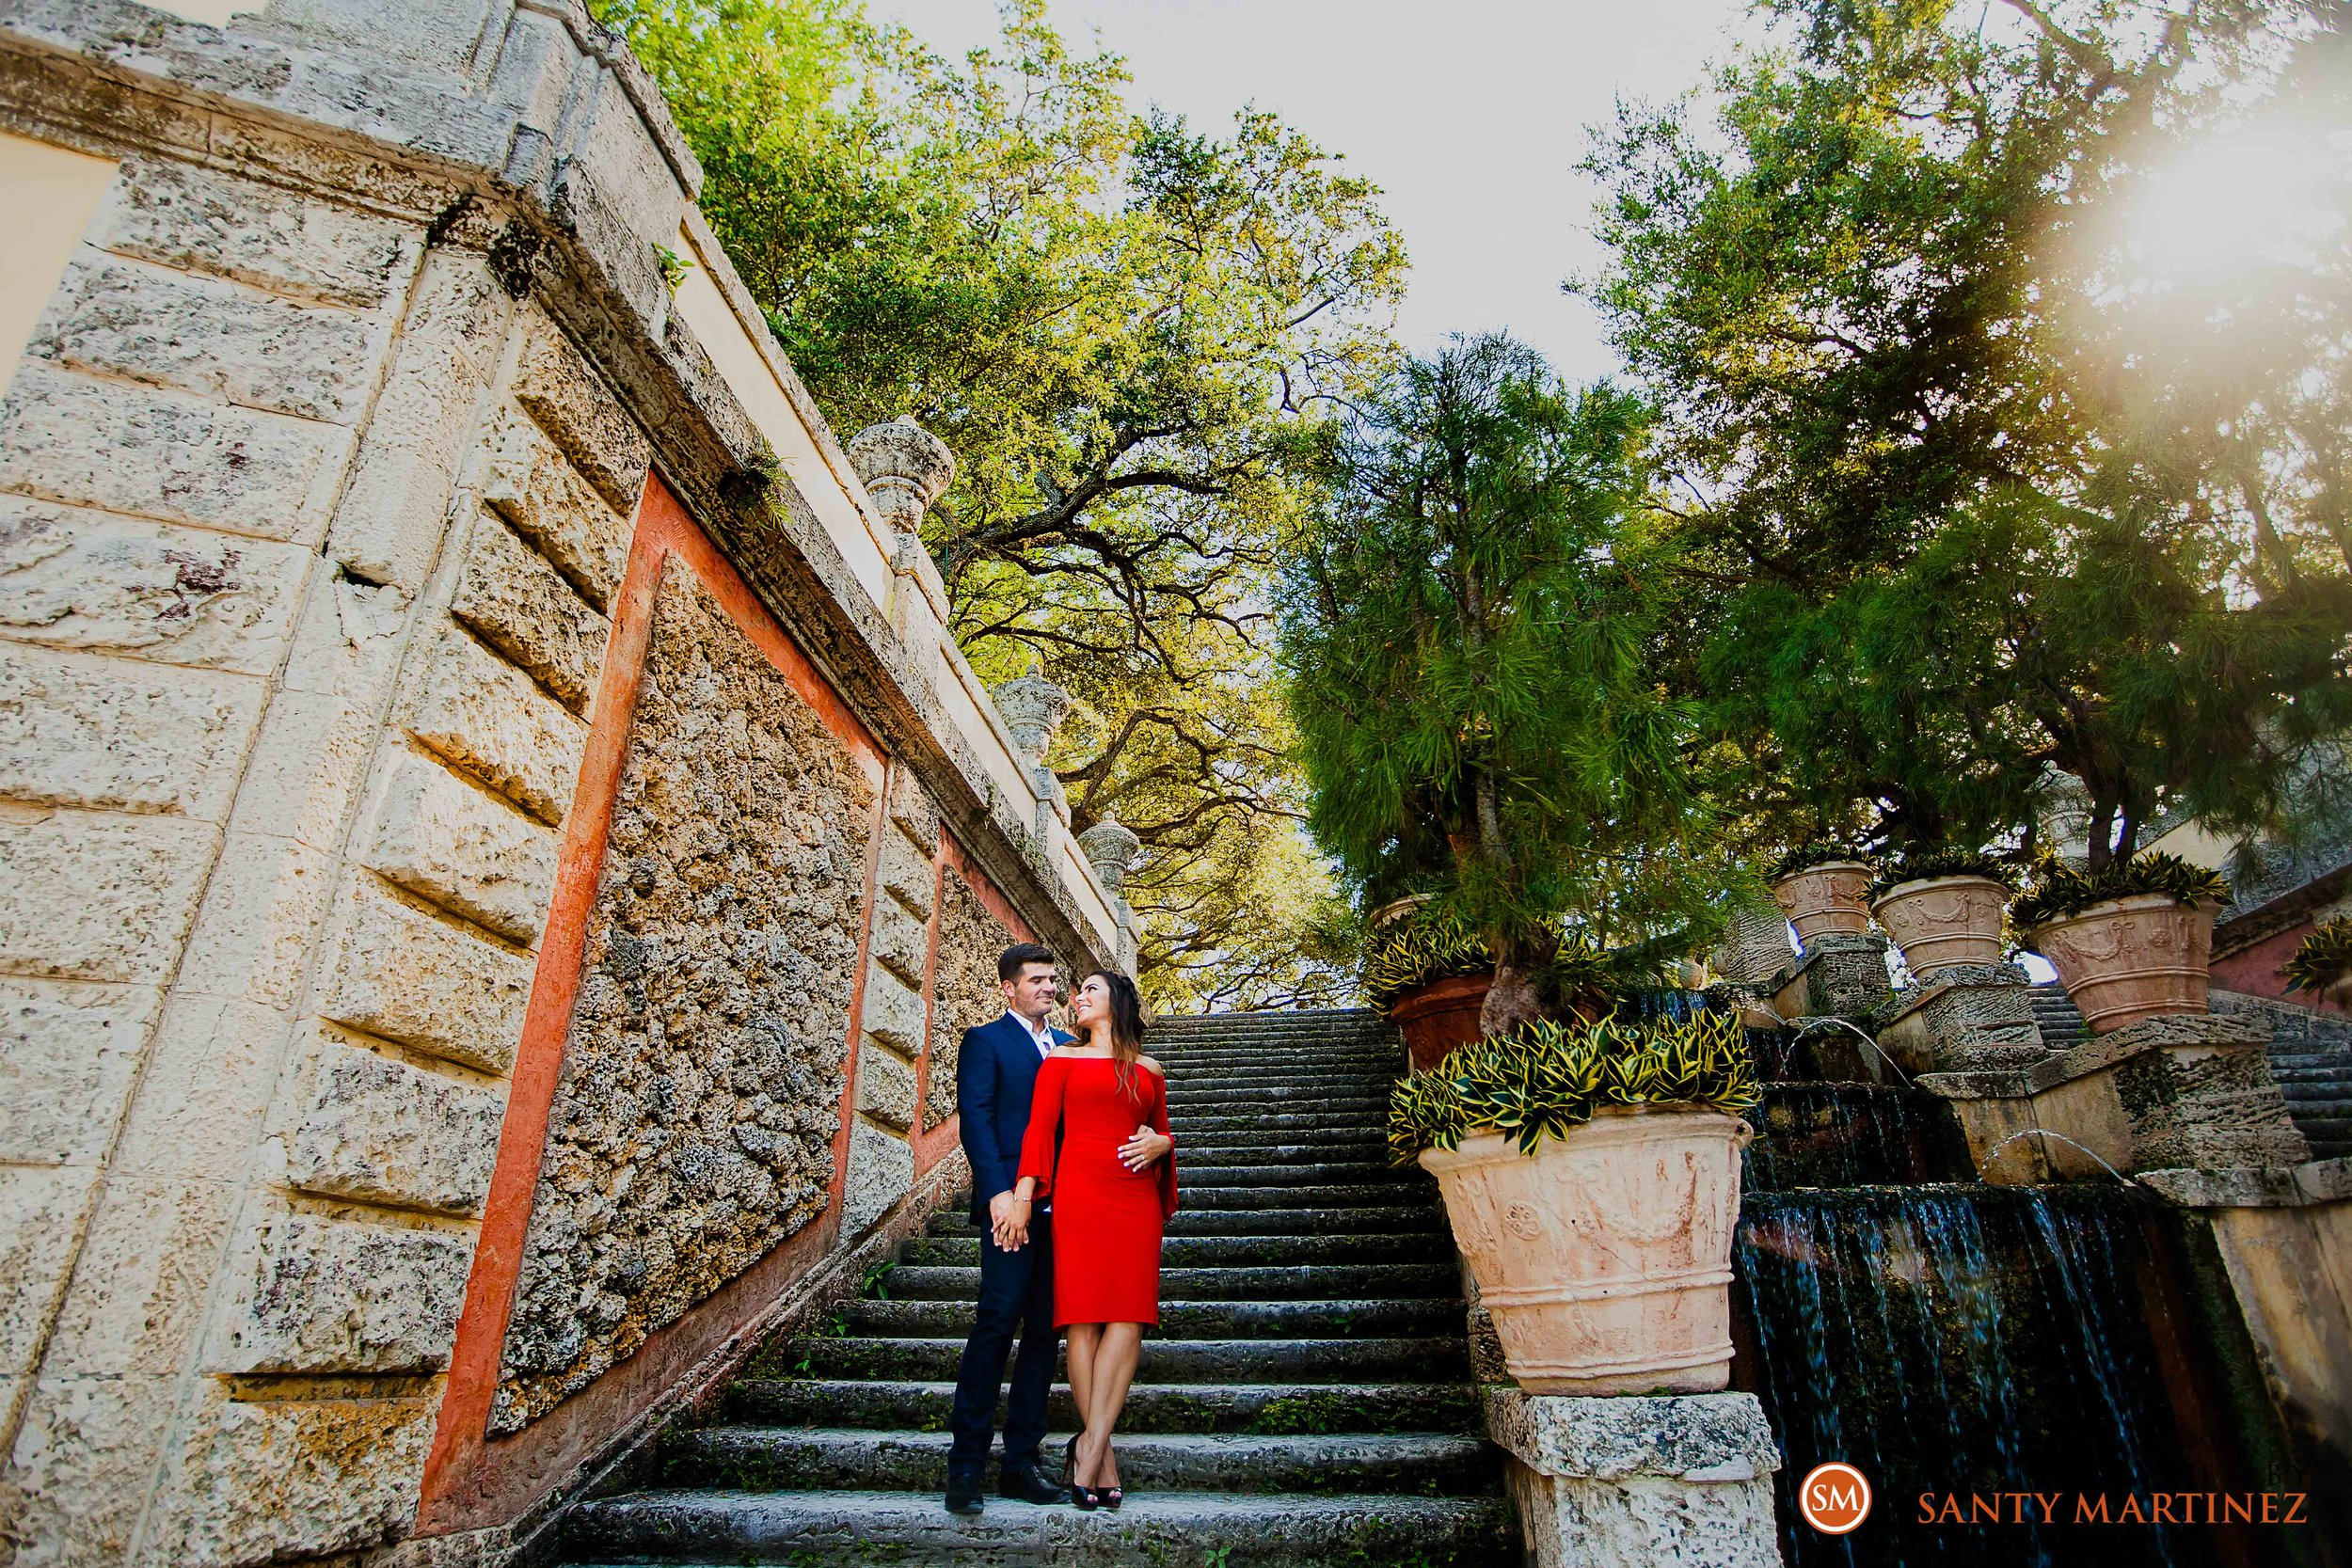 Engagement Session - Vizcaya - Photography by Santy Martinez-11.jpg